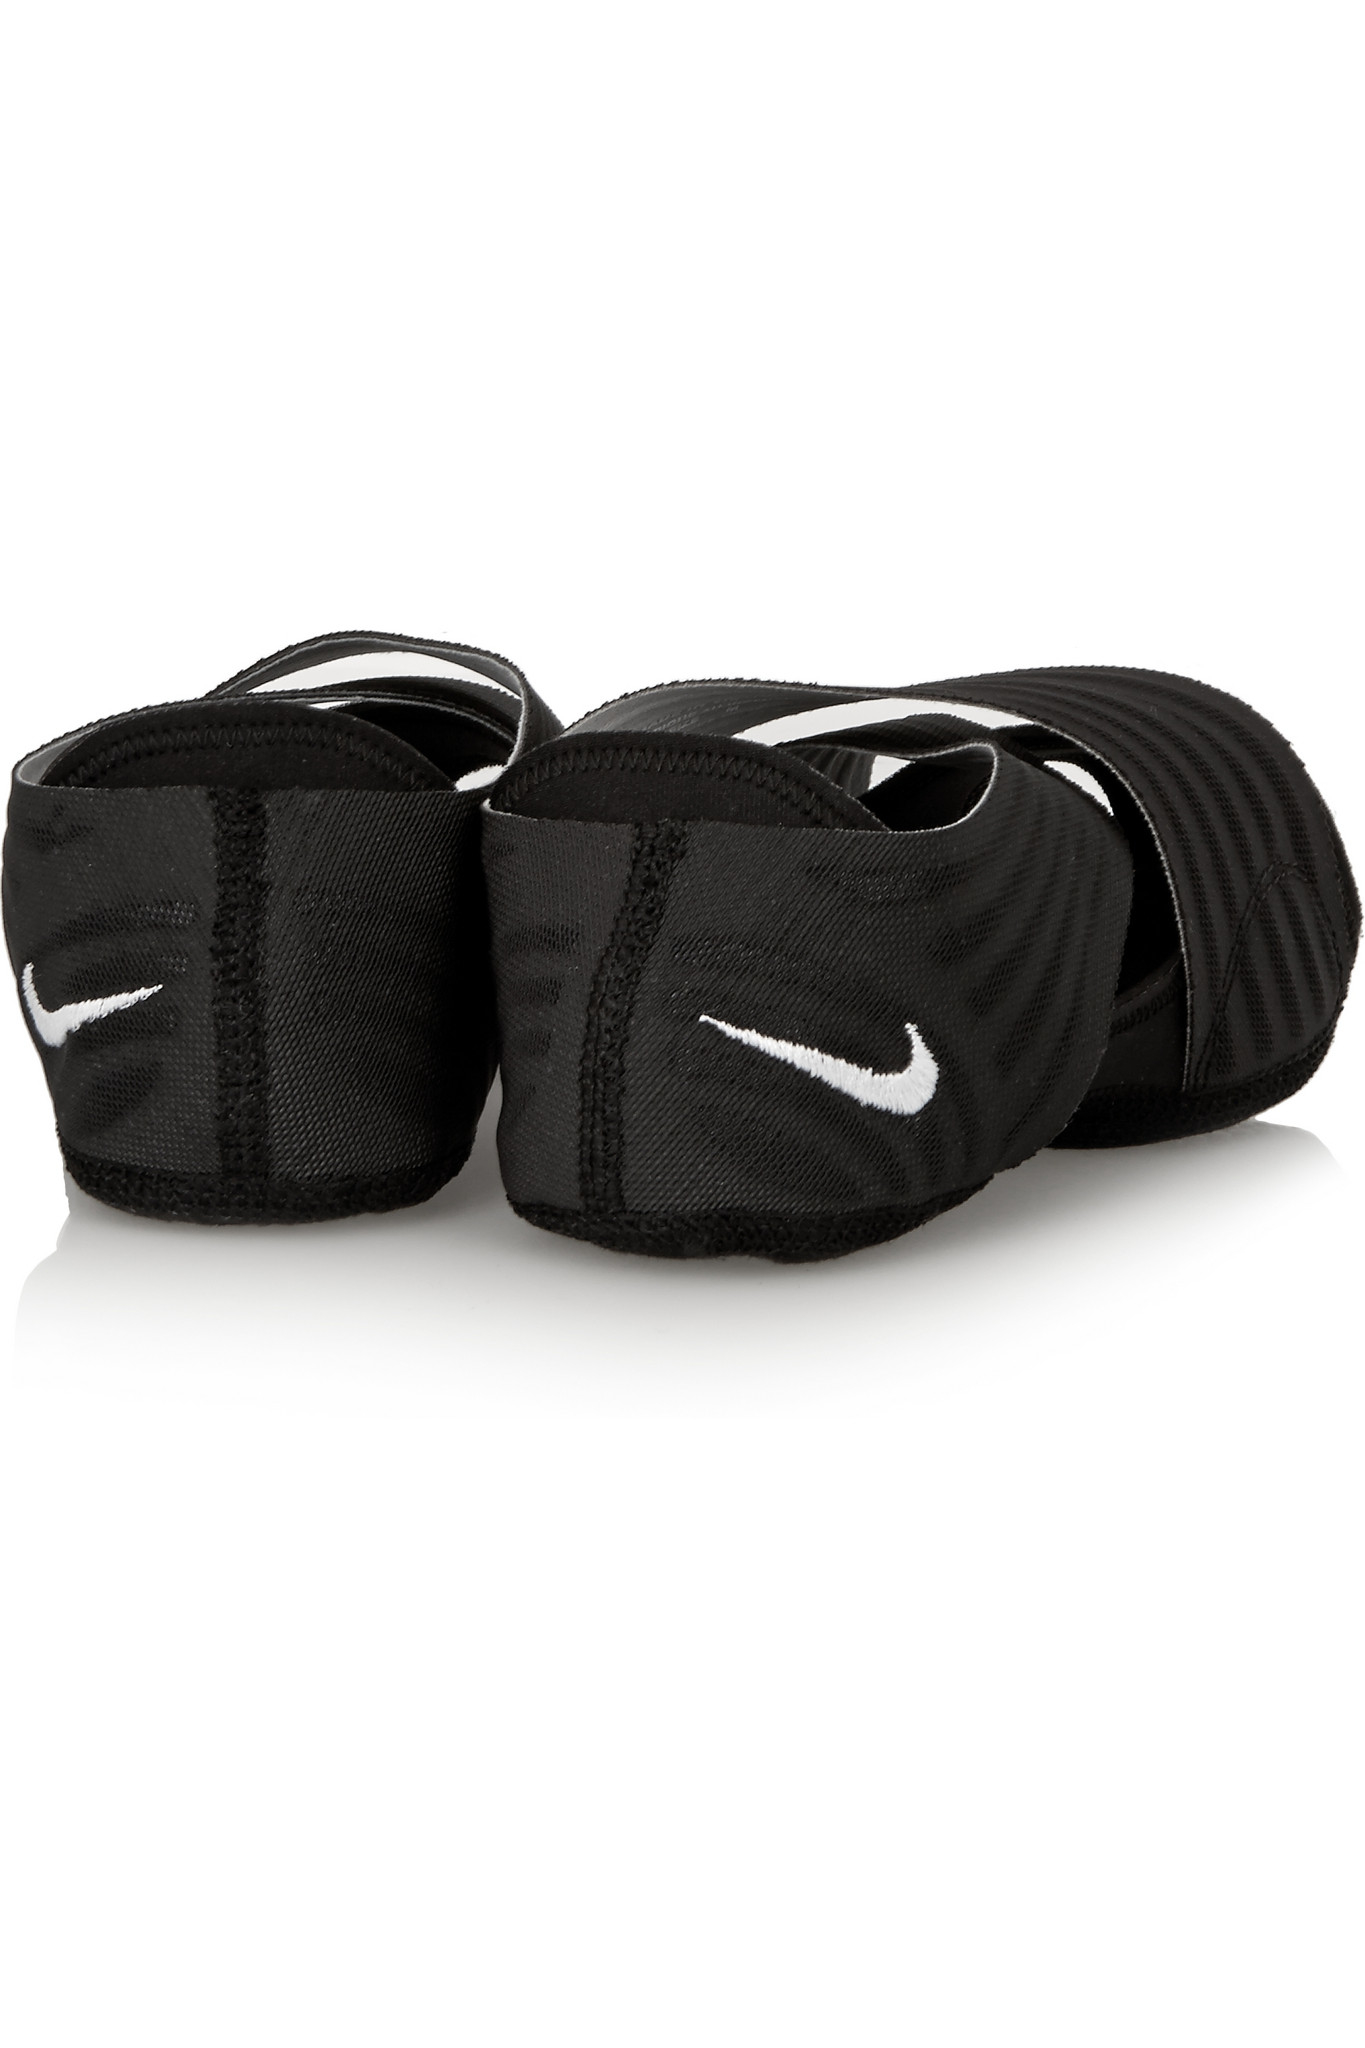 big sale 43696 d7487 nike-black-studio-wrap-elastic-yoga-shoes-product-6-545200752-normal.jpeg